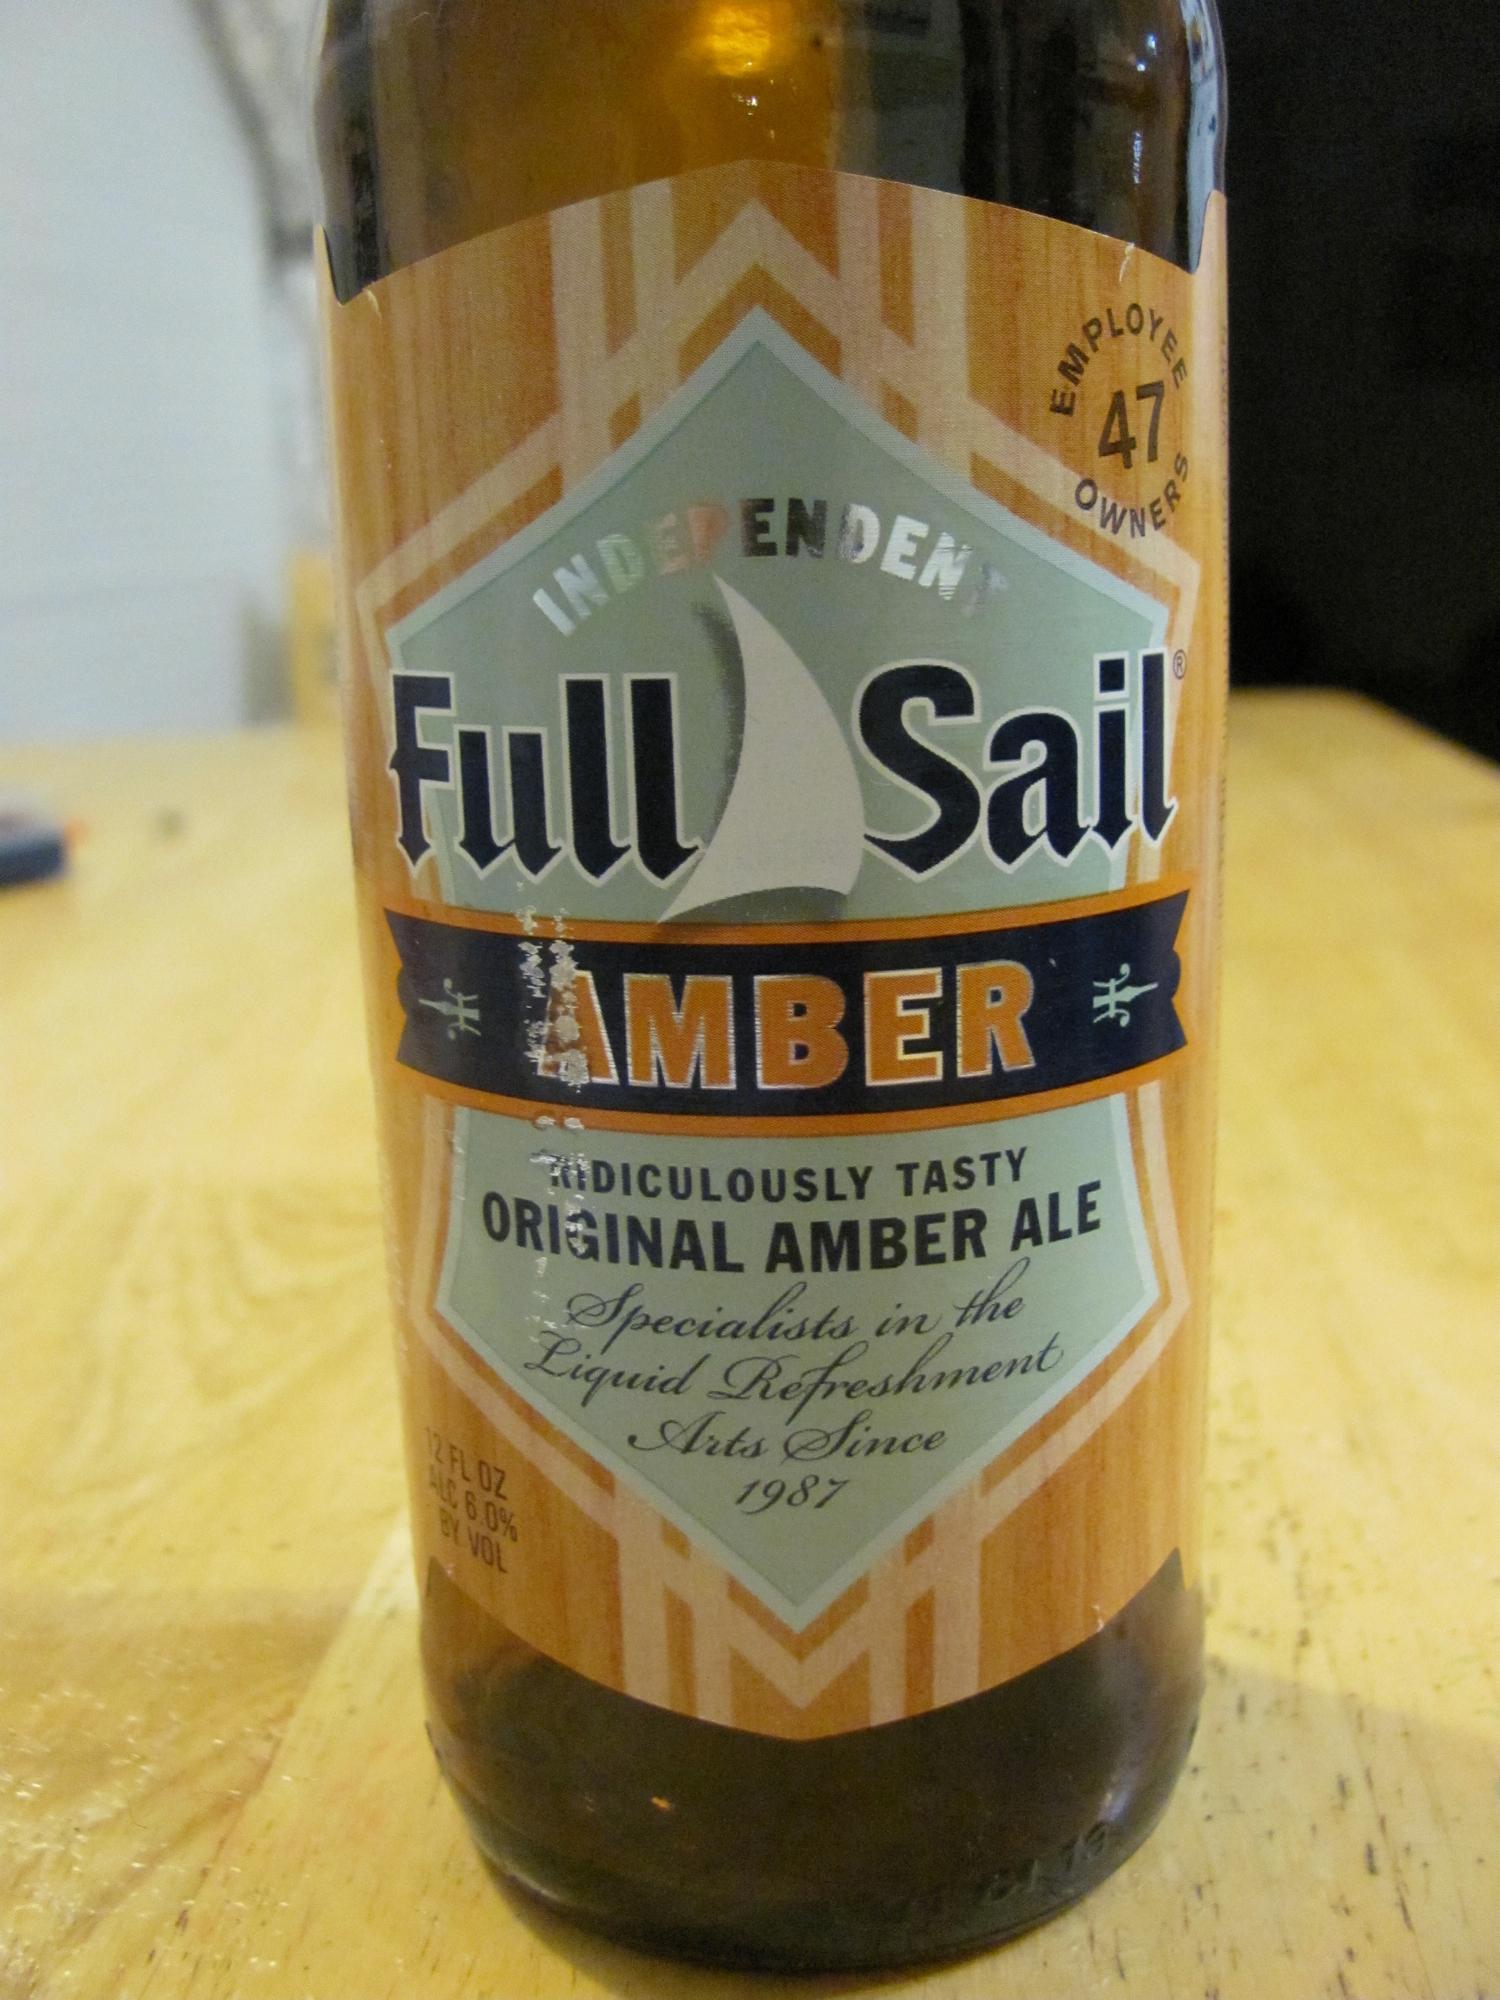 Full Sail Amber